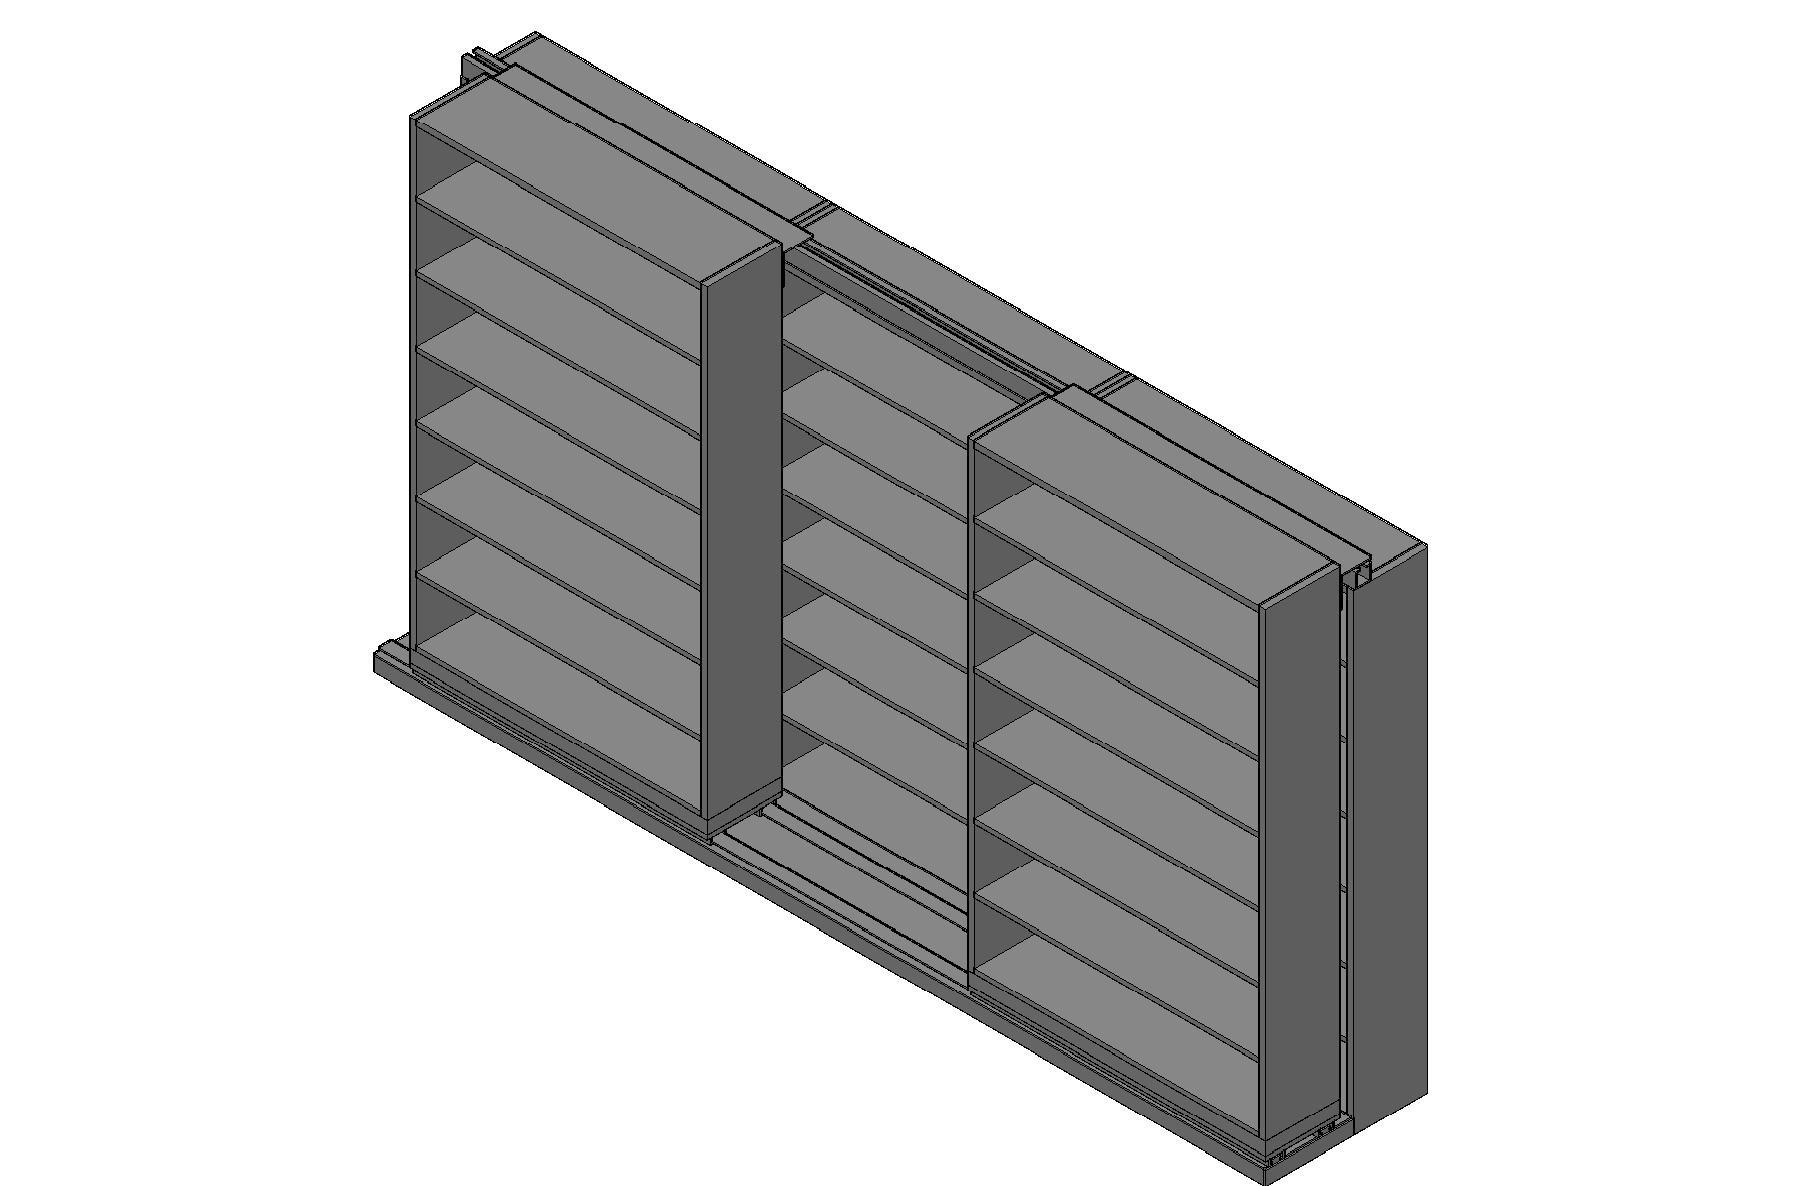 "Letter Size Sliding Shelves - 2 Rows Deep - 7 Levels - (48"" x 12"" Shelves) - 148"" Total Width"